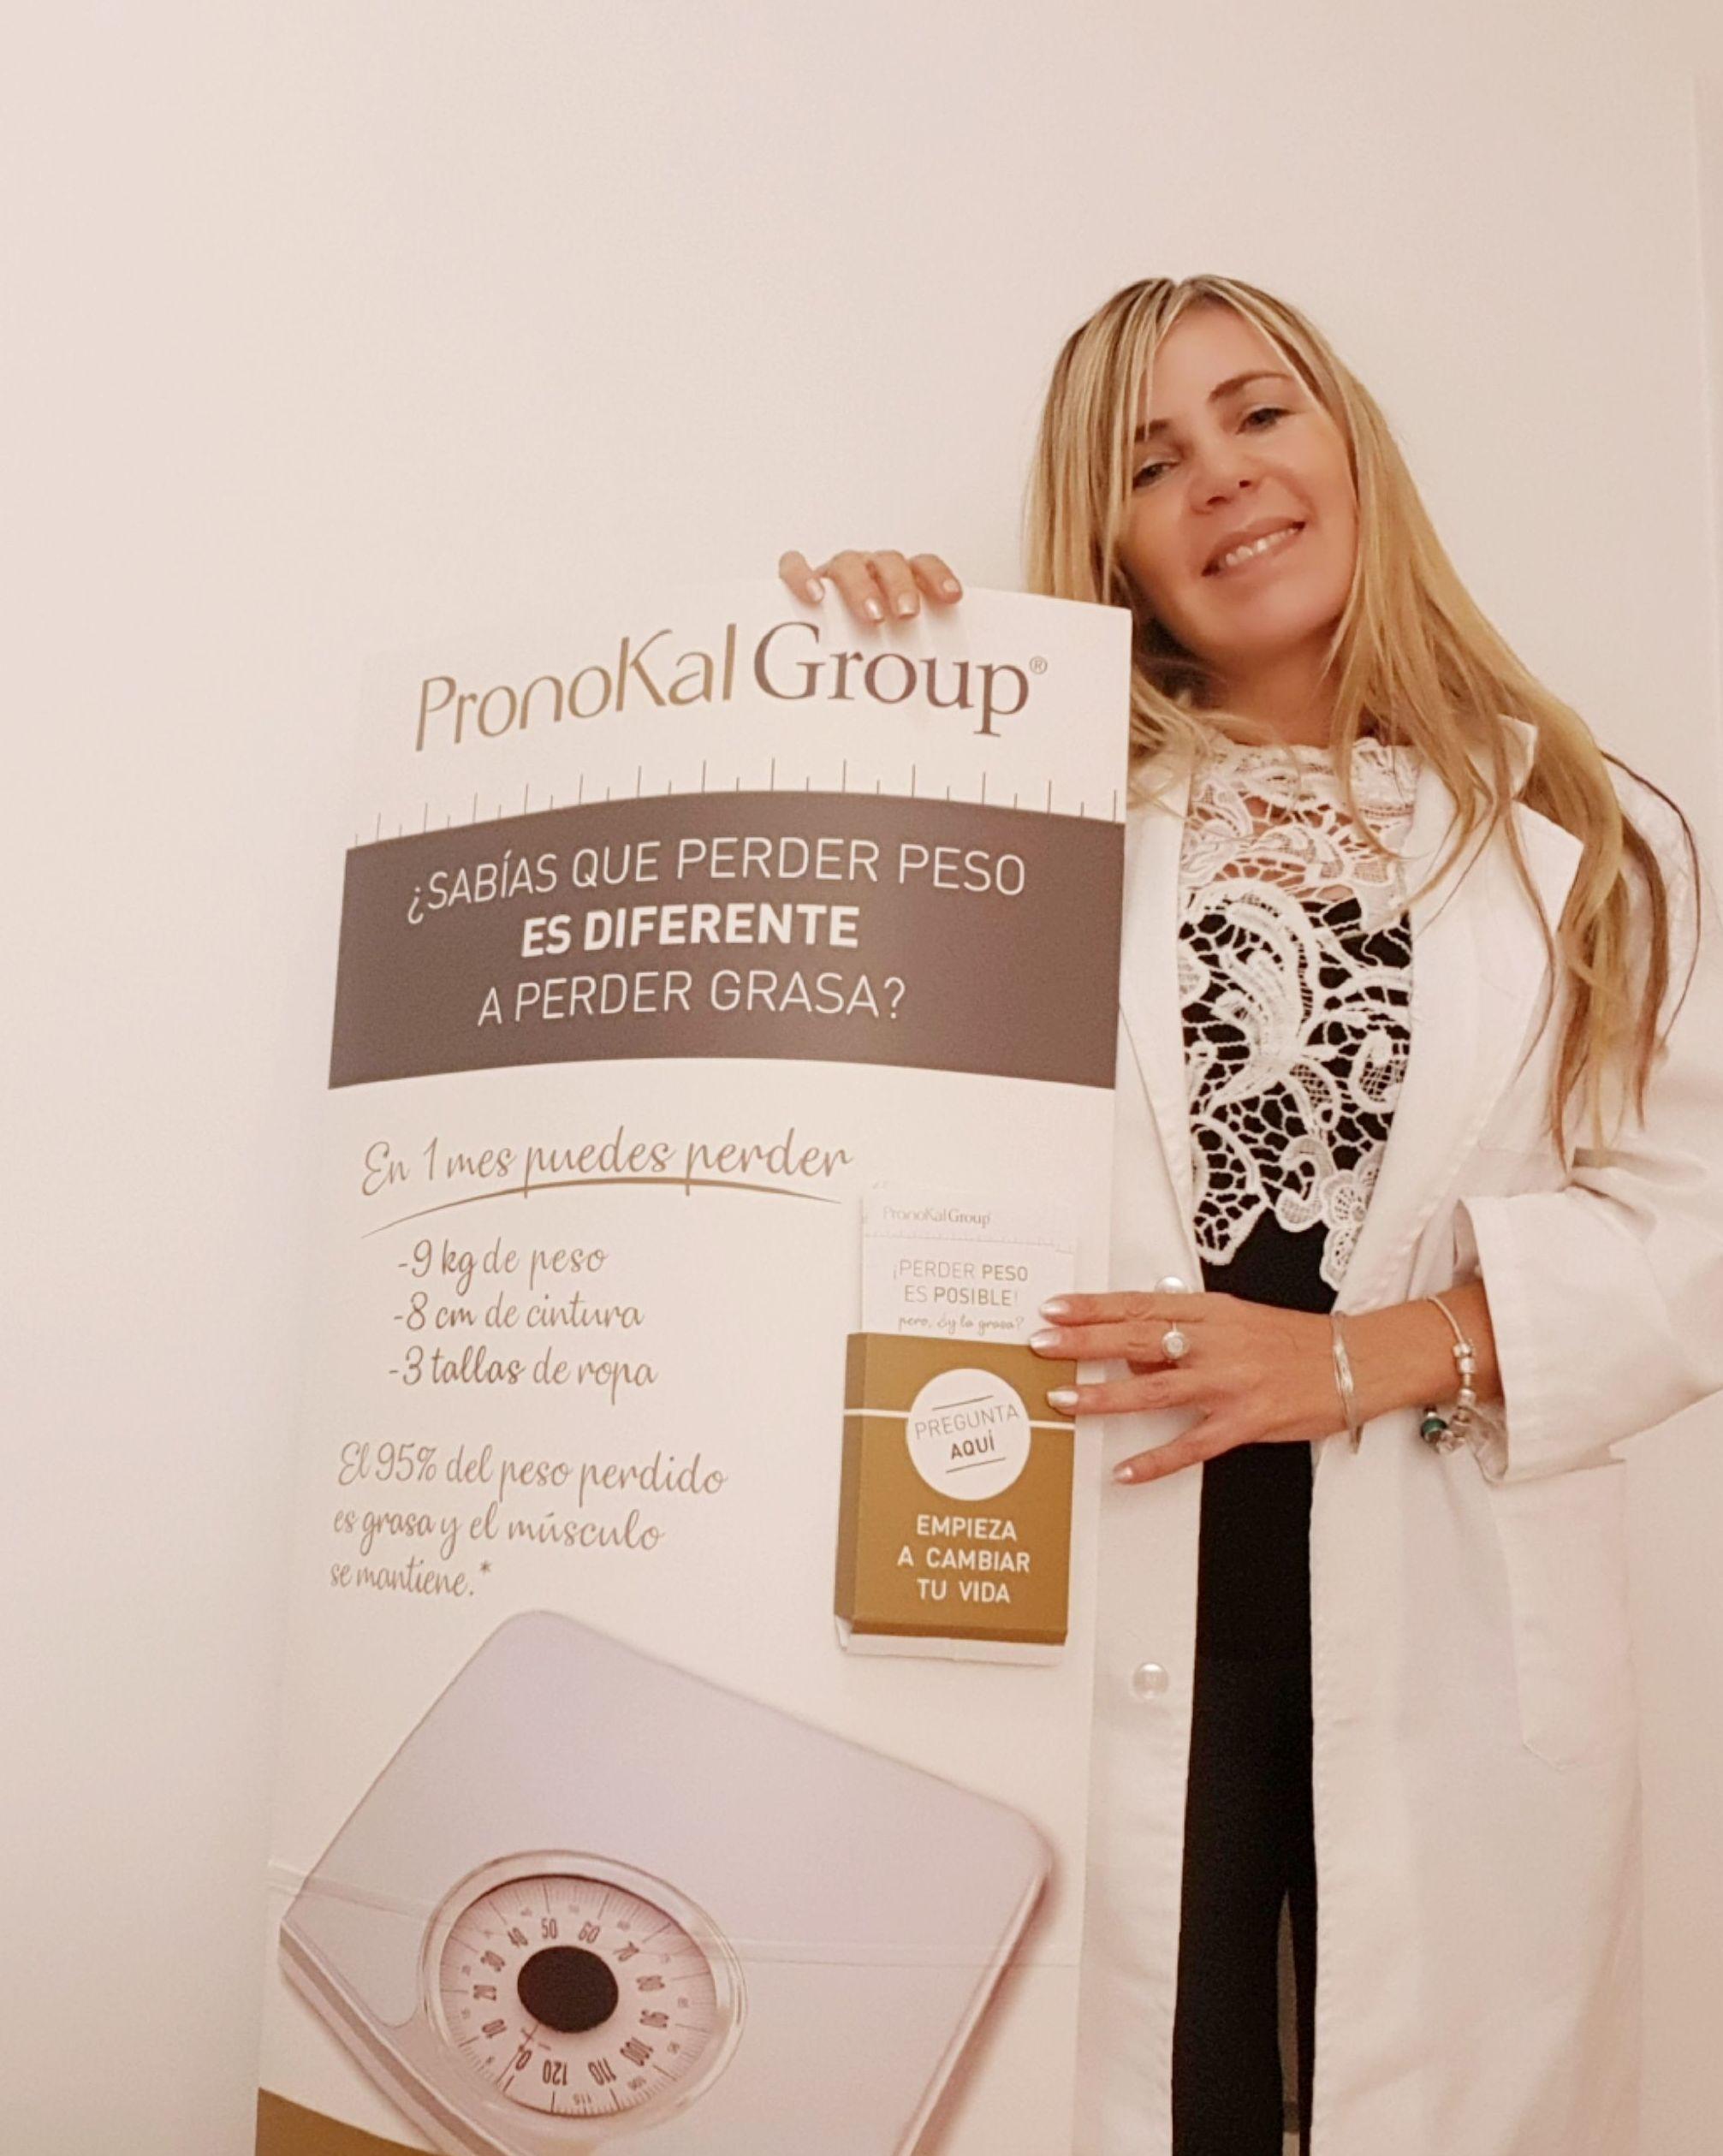 Pronokal PNK PÉRDIDA DE PESO TENERIFE SUR